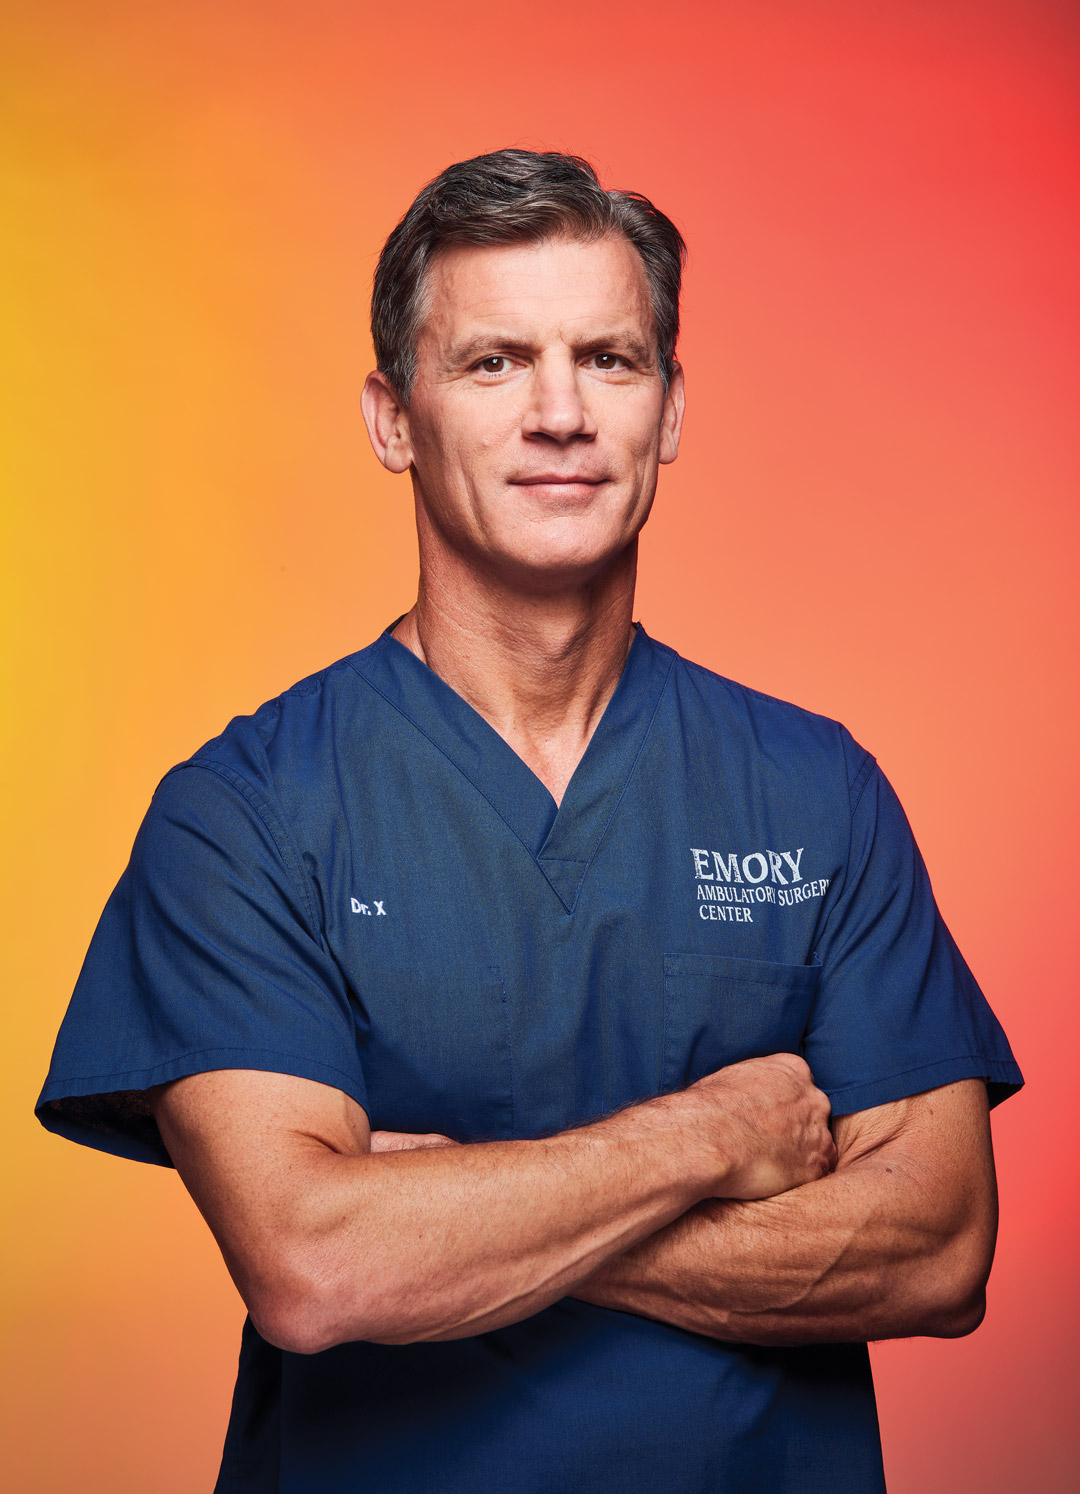 Top Doctors in Atlanta: John Xerogeanes